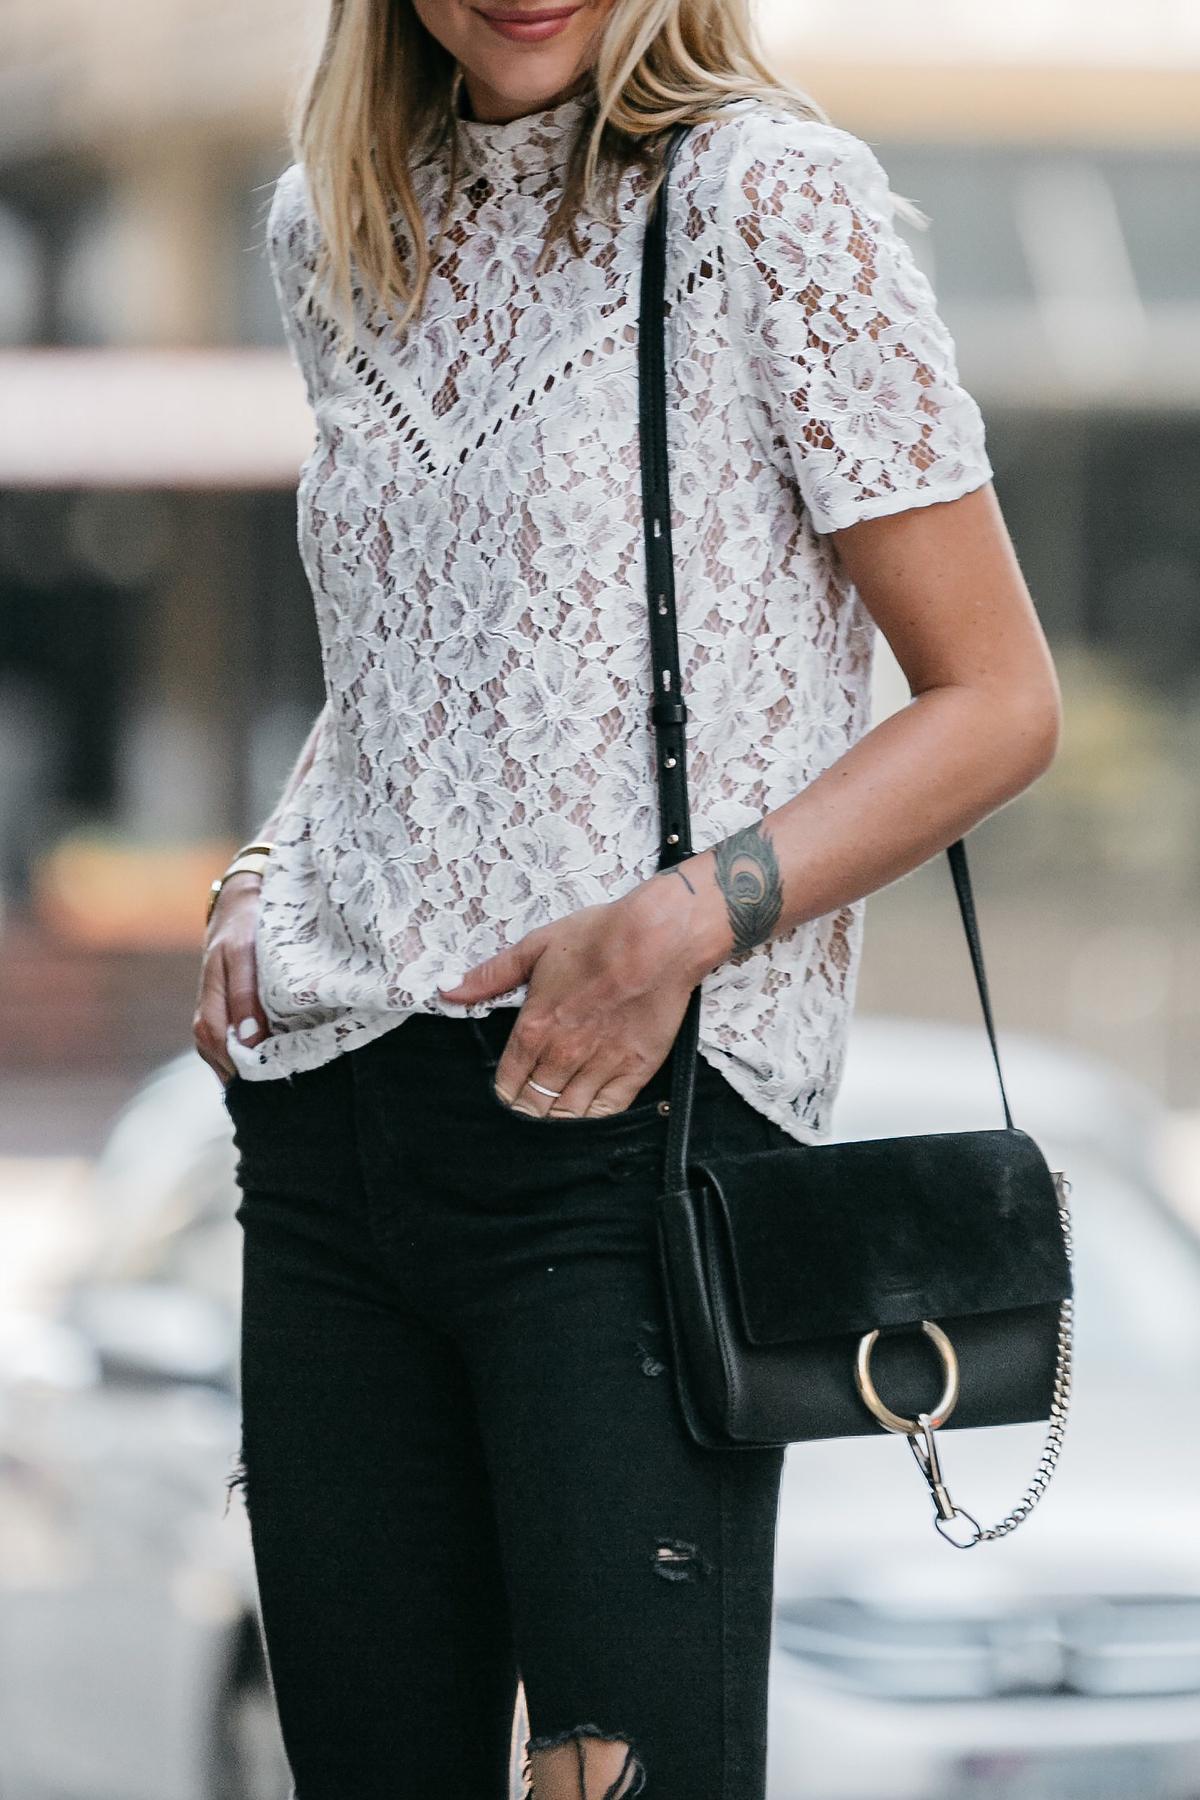 89b07958507ddb Nordstrom Anniversary Sale White Lace Top Zara Black Ripped Skinny Jeans  Outfit Chloe Faye Handbag Fashion